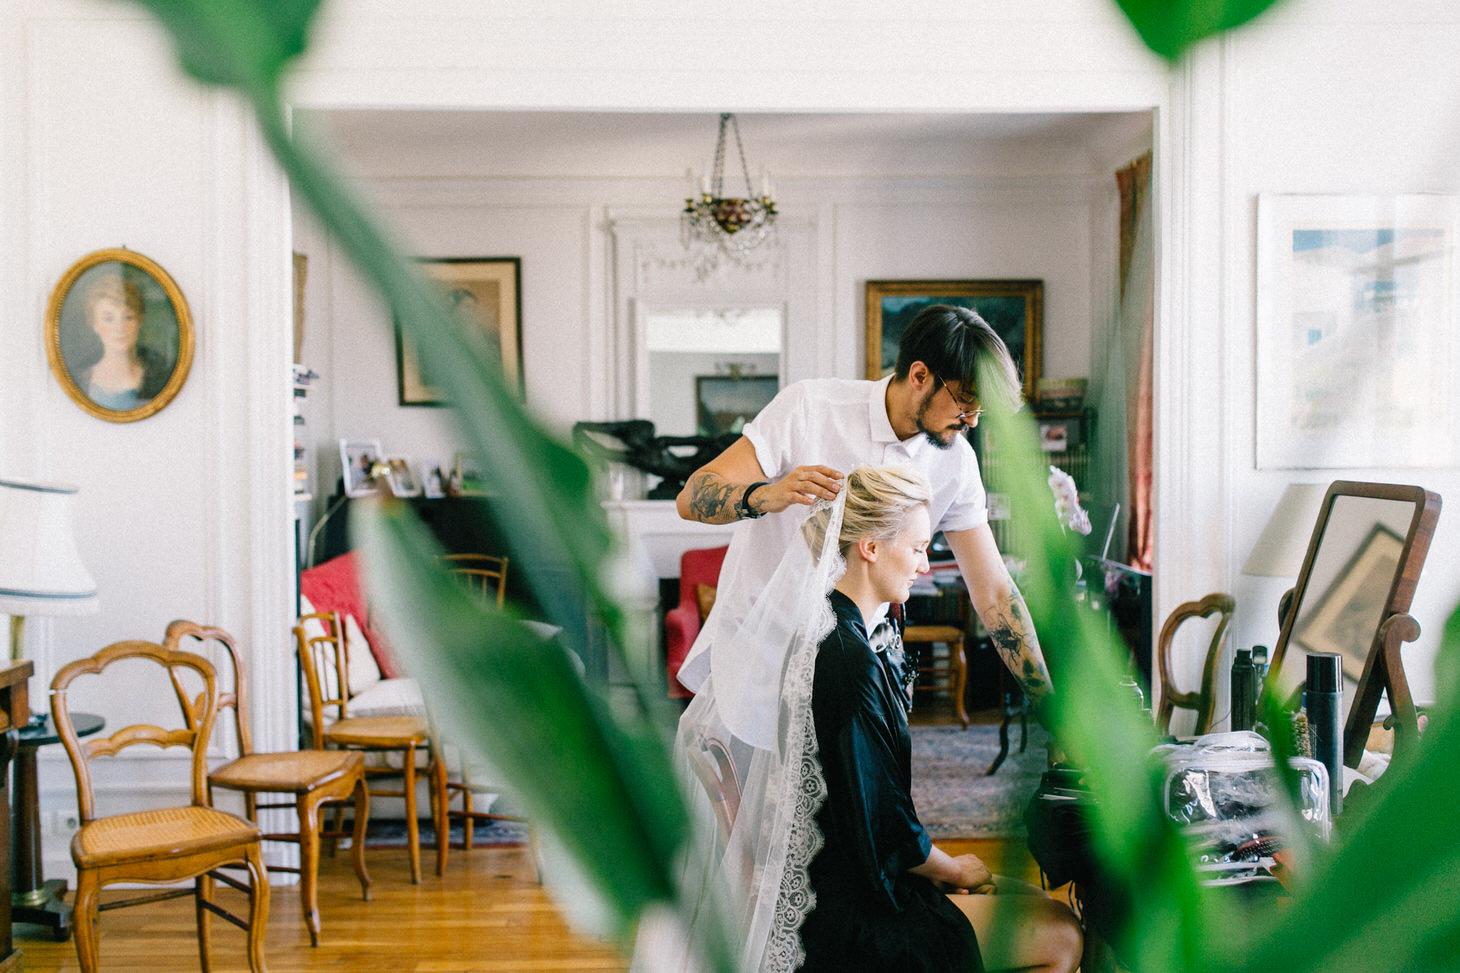 photographe-mariage-paris-montfort-l-amaury-004